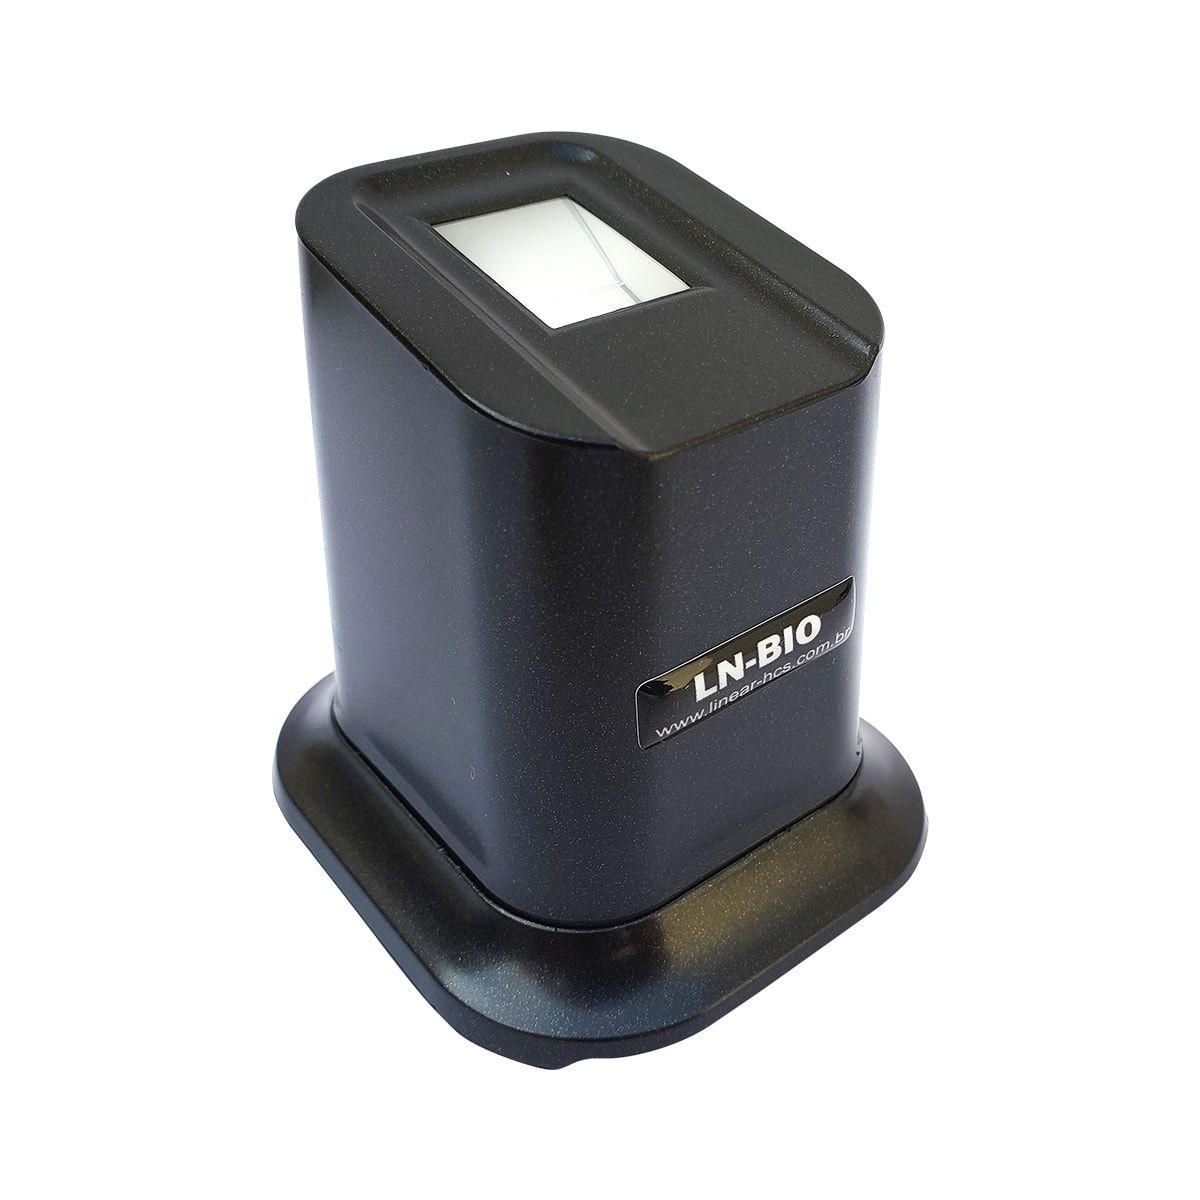 Leitor Biométrico de Impressão Digital Linear-HCS USB Ln-Bio  - CFTV Clube | Brasil